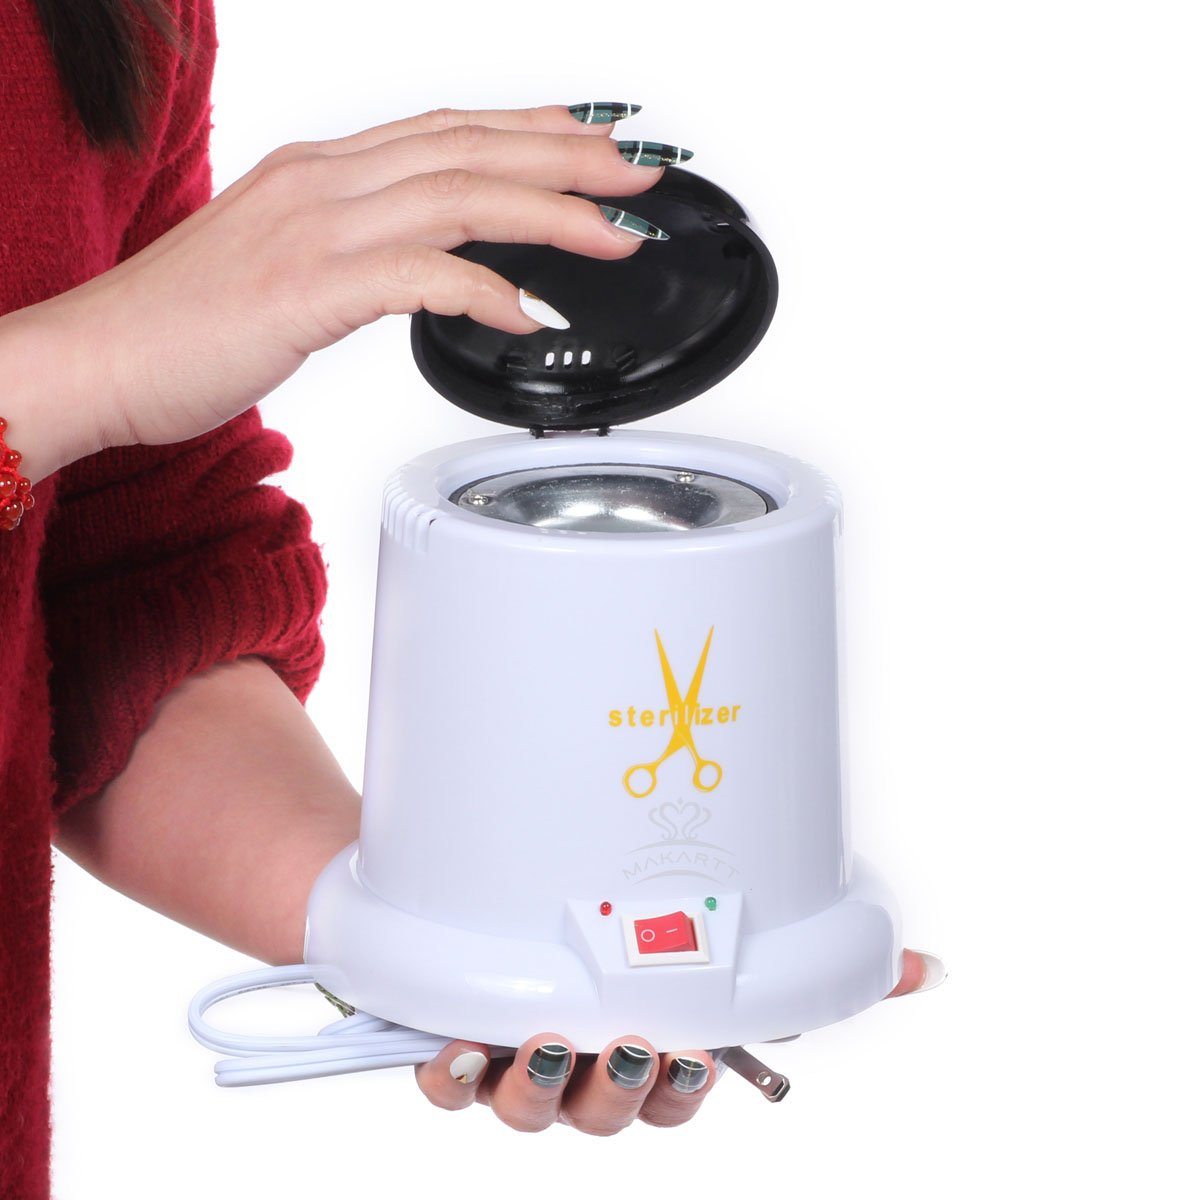 Makartt Nail Sterilizer Disinfect Machine High Temperature Metal Tattoo Art Nipper Tools Clean Pot by Makartt